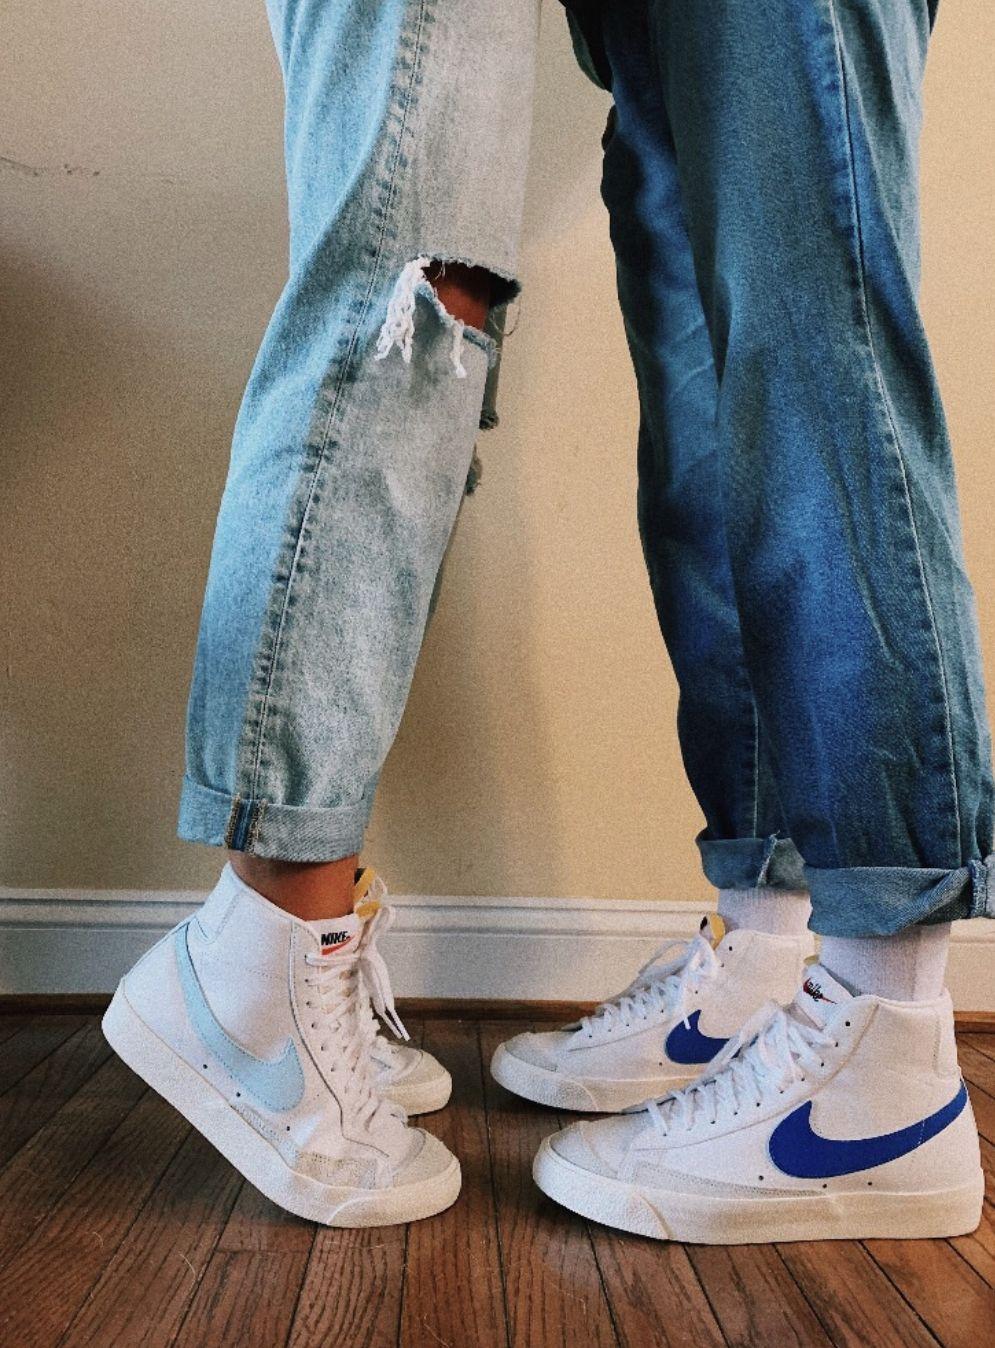 Pin De Hilal Yurdakul En Shoes I Can T Afford Ropa De Pareja Zapatos Mujer De Moda Nike Zapatillas Mujer Blancas